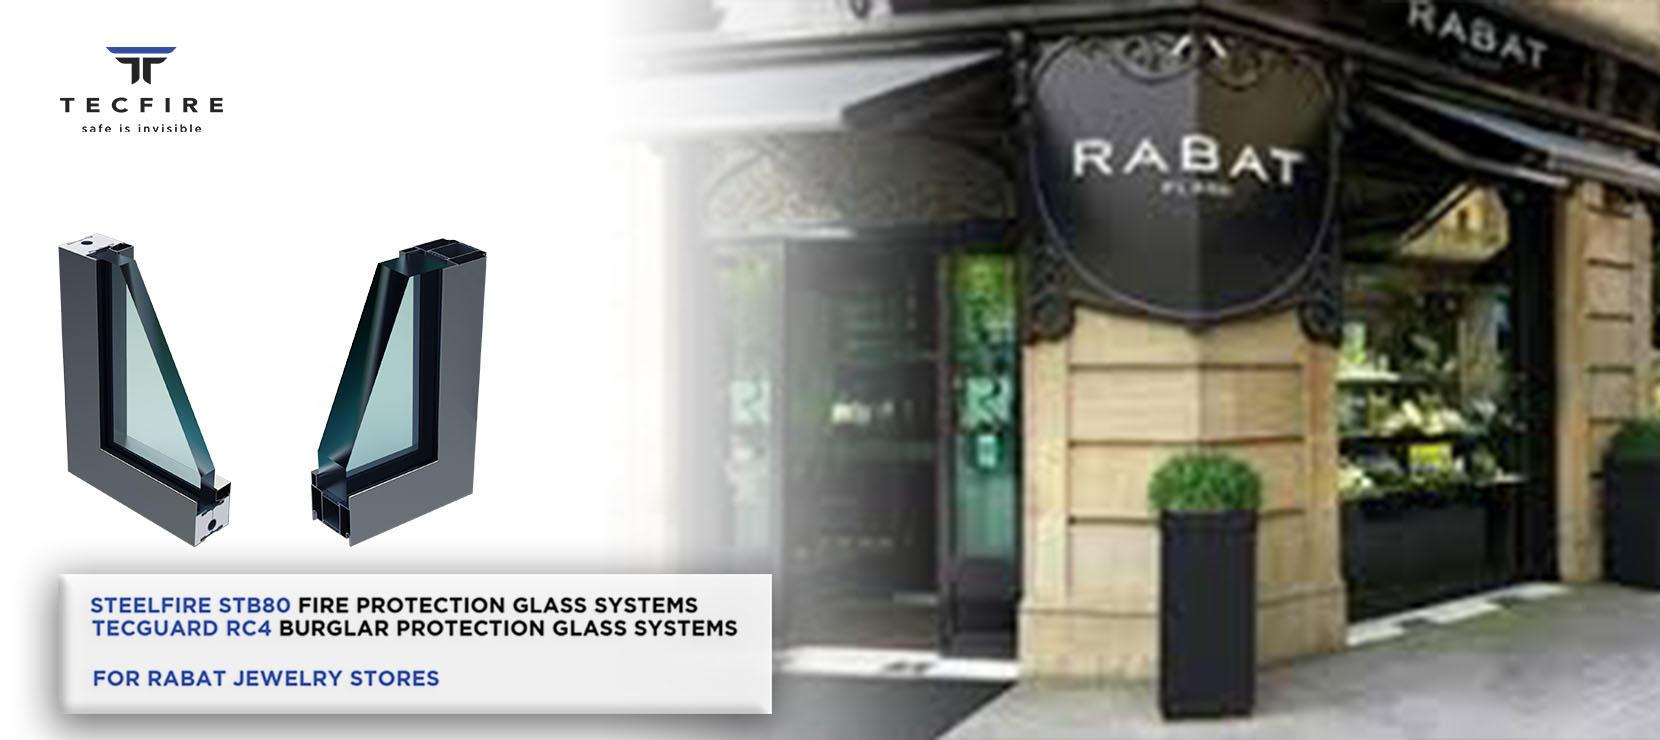 New Project: Rabat Jewelry Store